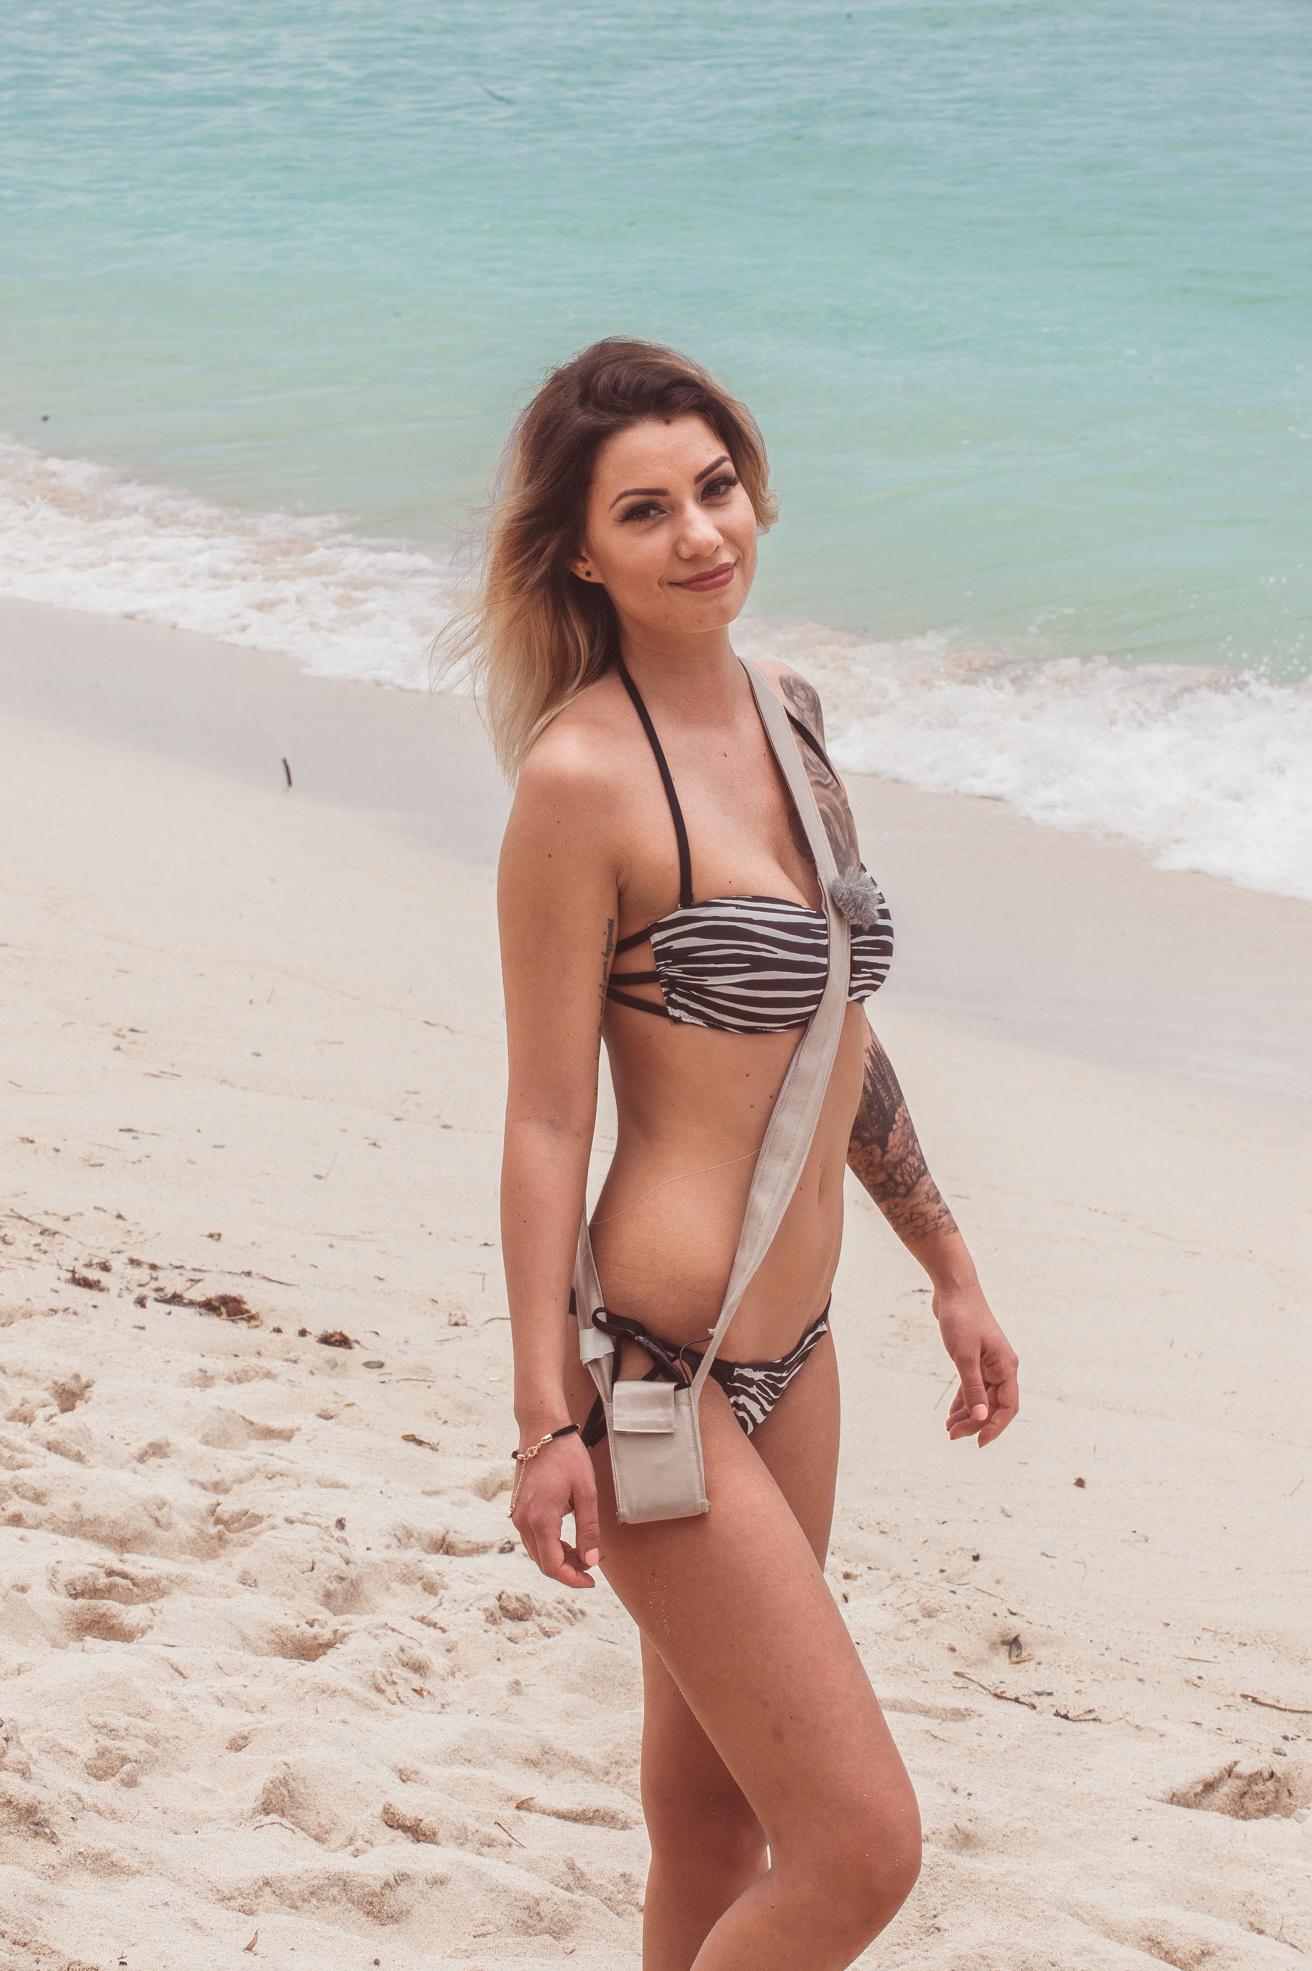 Bikini Timea Vajna nudes (21 foto and video), Tits, Leaked, Selfie, see through 2020